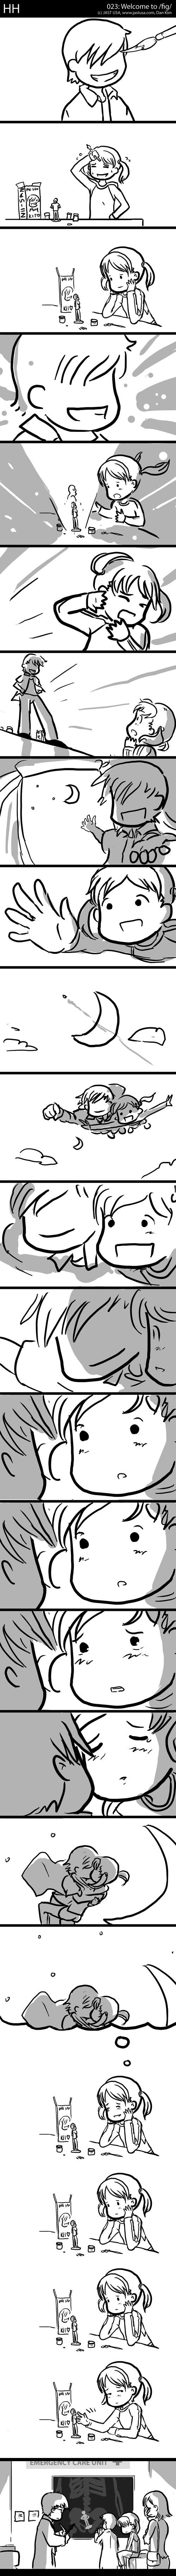 [HH - strip 23]